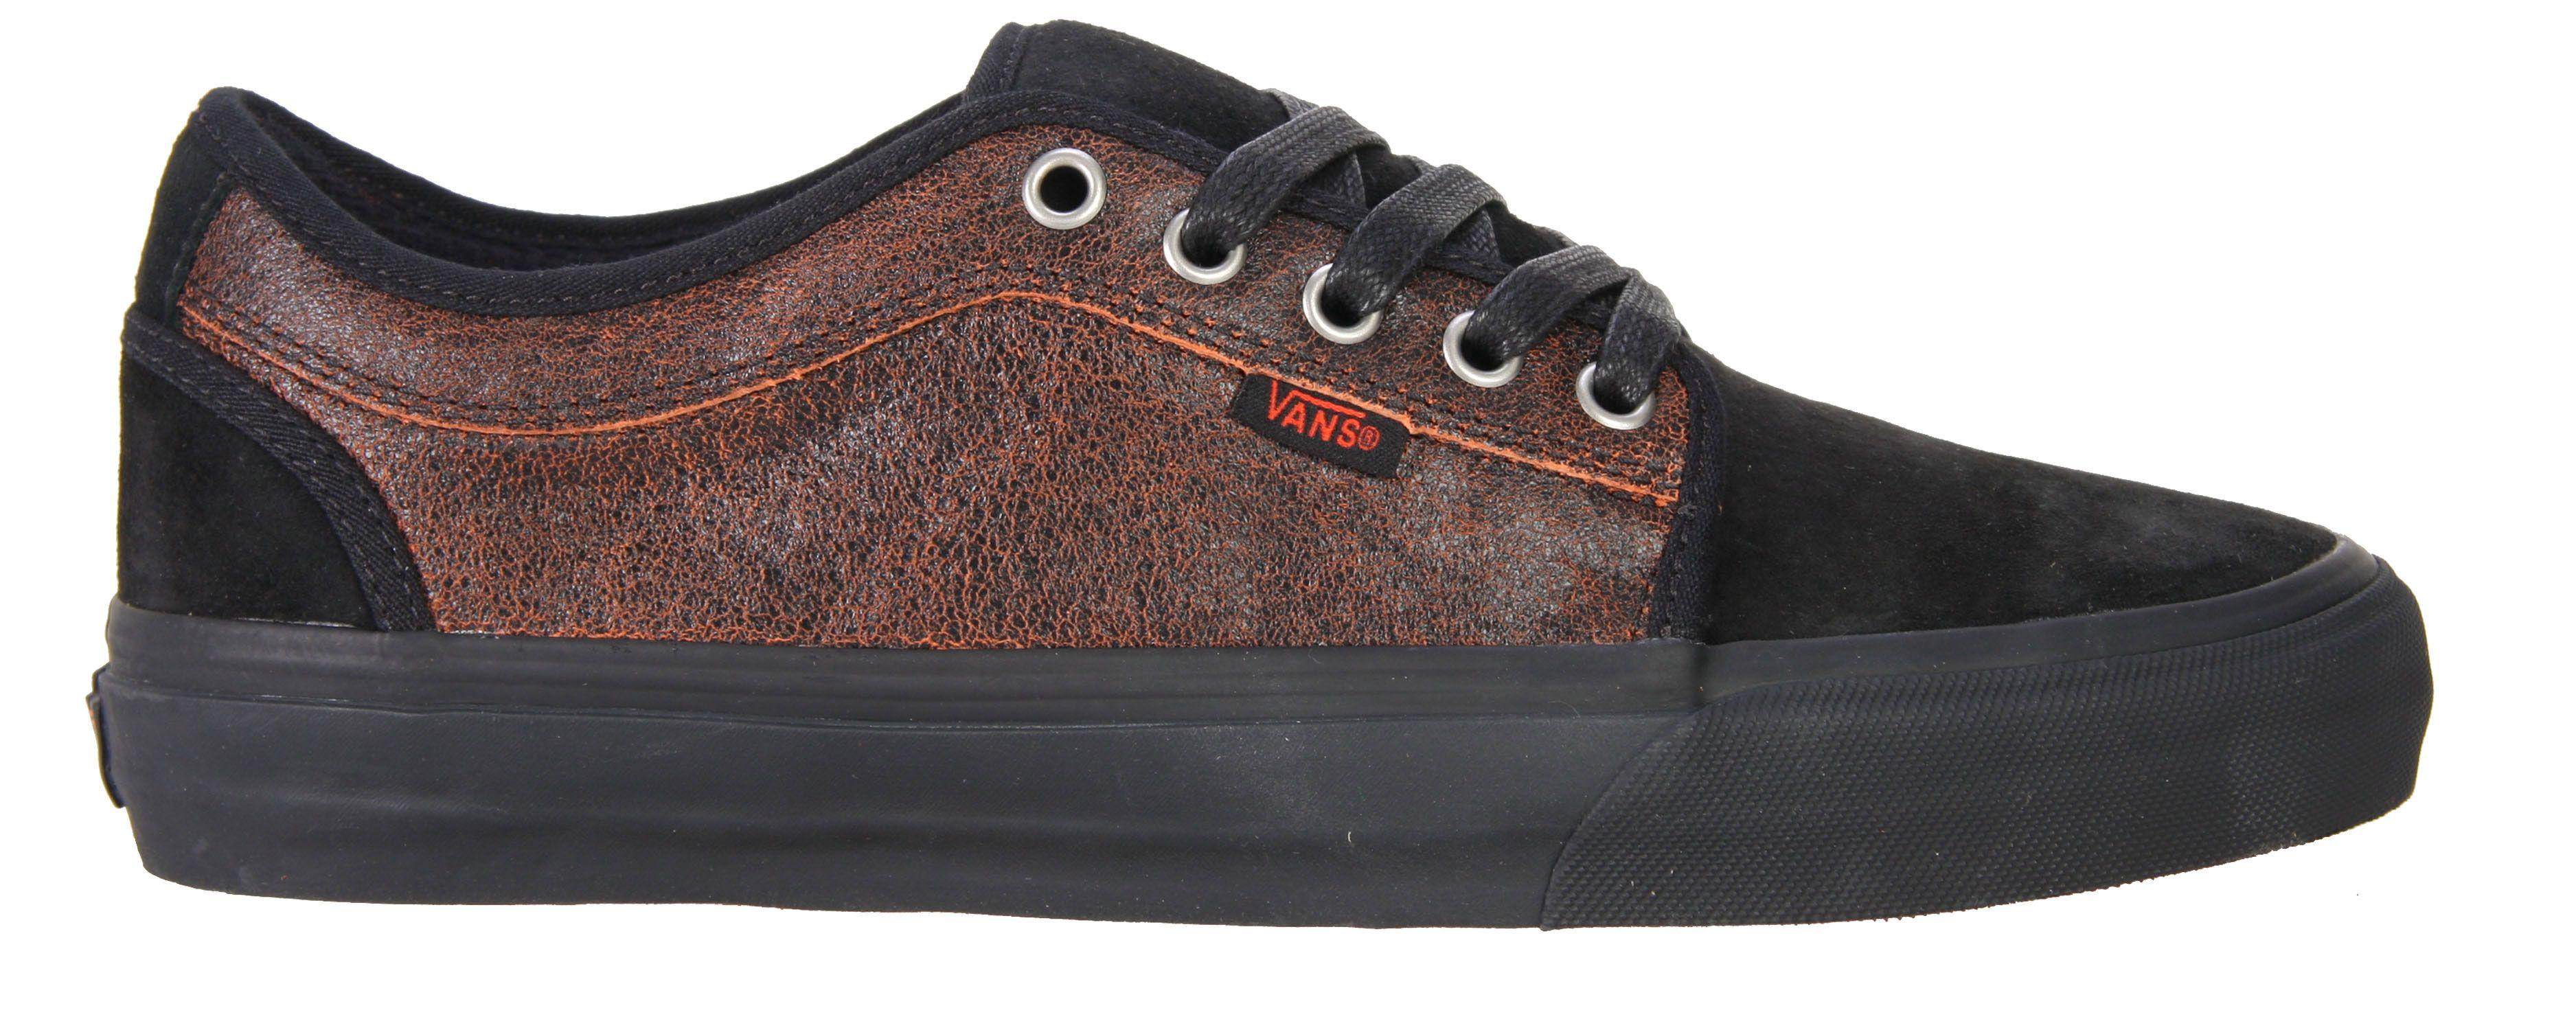 c2ab3f9dce08 Vans Chukka Low Skate Shoes Black Orange - Men s